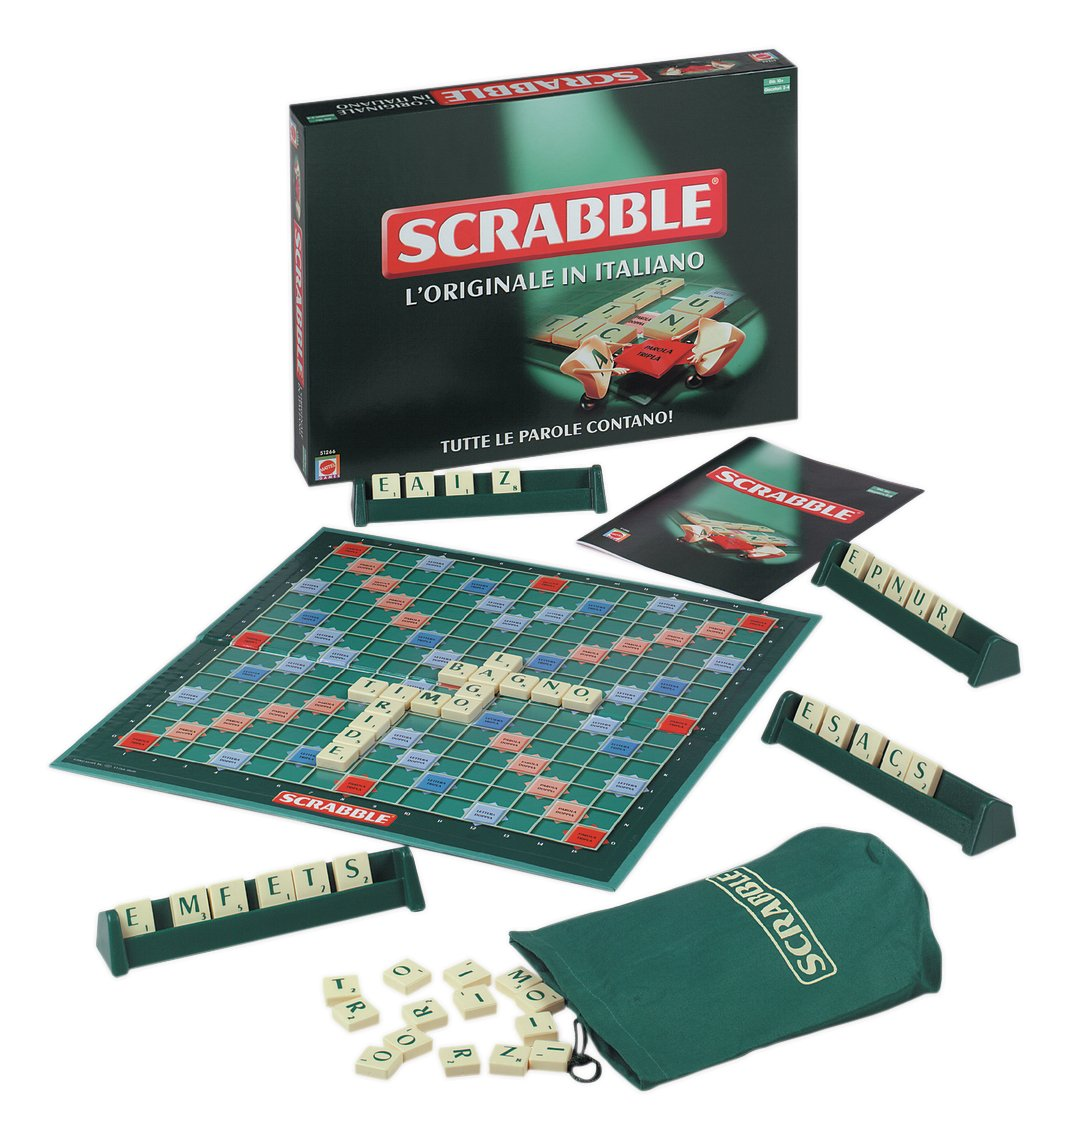 Venta barata Mattel Juegos 51266 – Scrabble [Italiano] [Italiano] [Italiano]  muchas concesiones